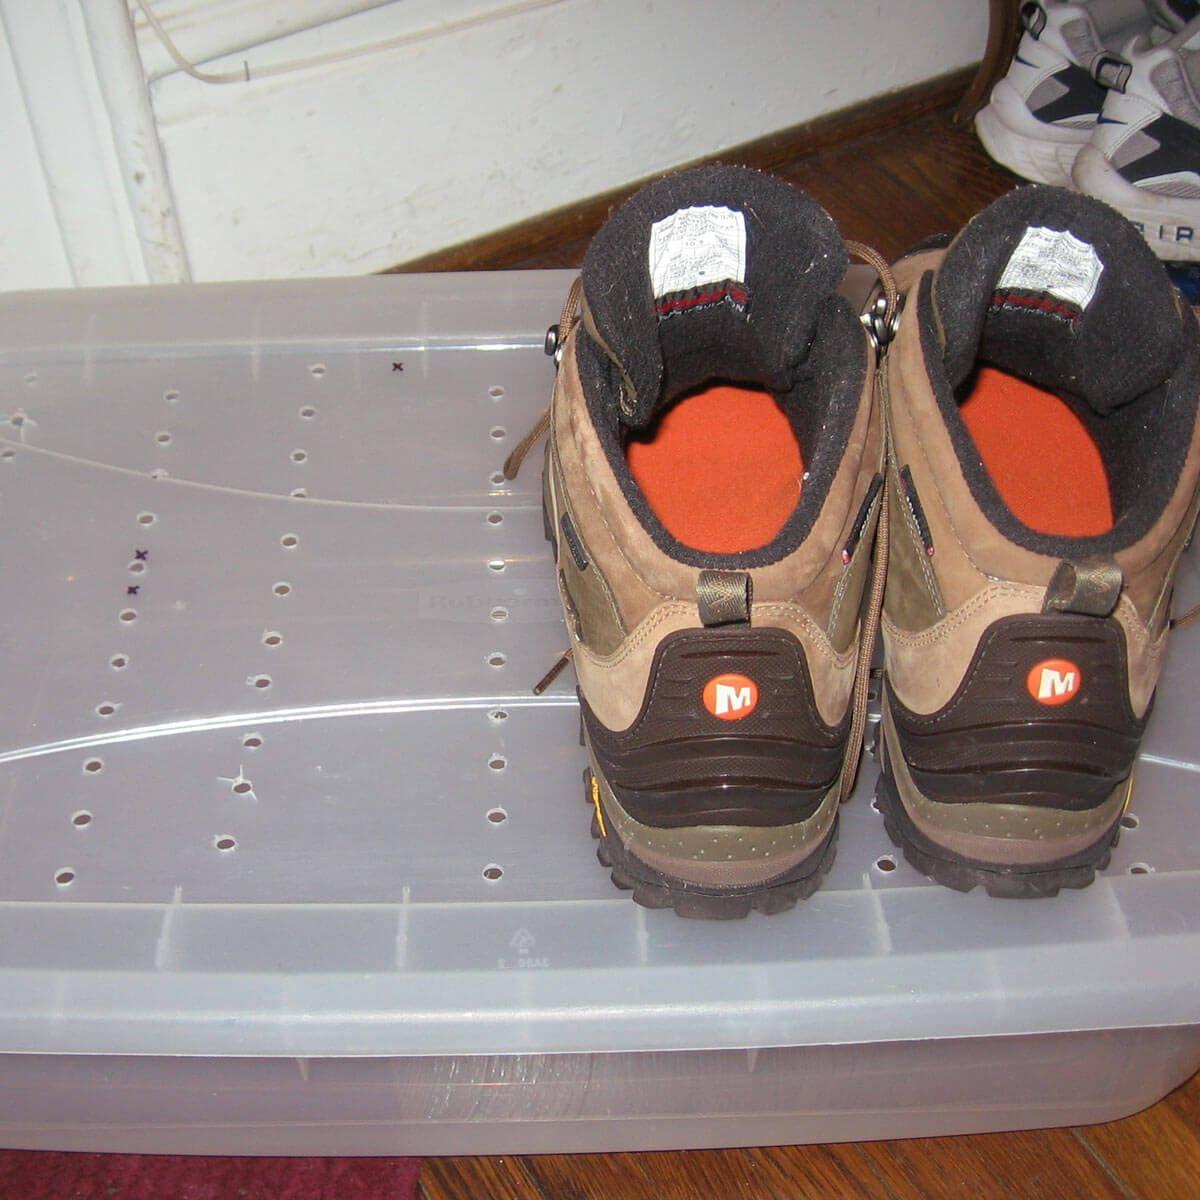 plastic bin boot tray